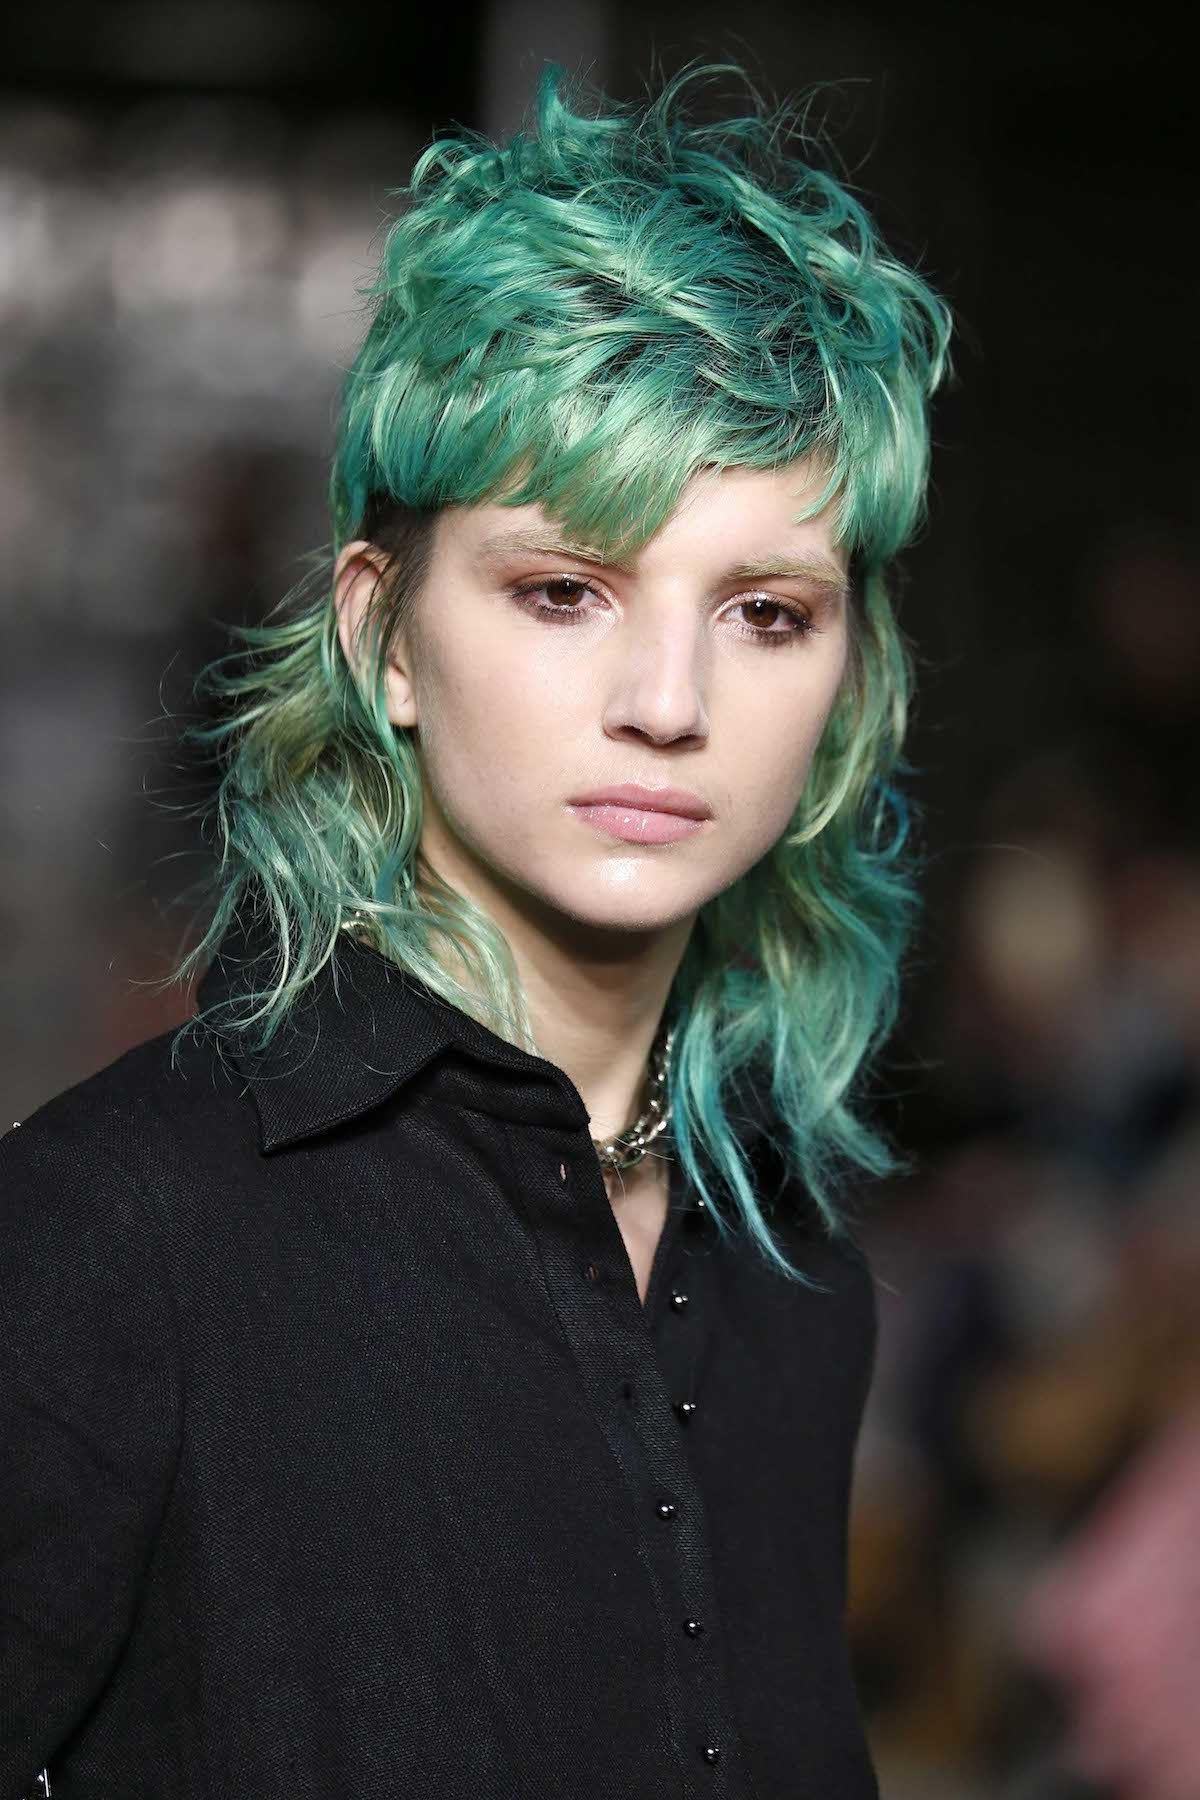 Wanita kaukasia dengan model rambut shaggy panjang dengan shaved skin